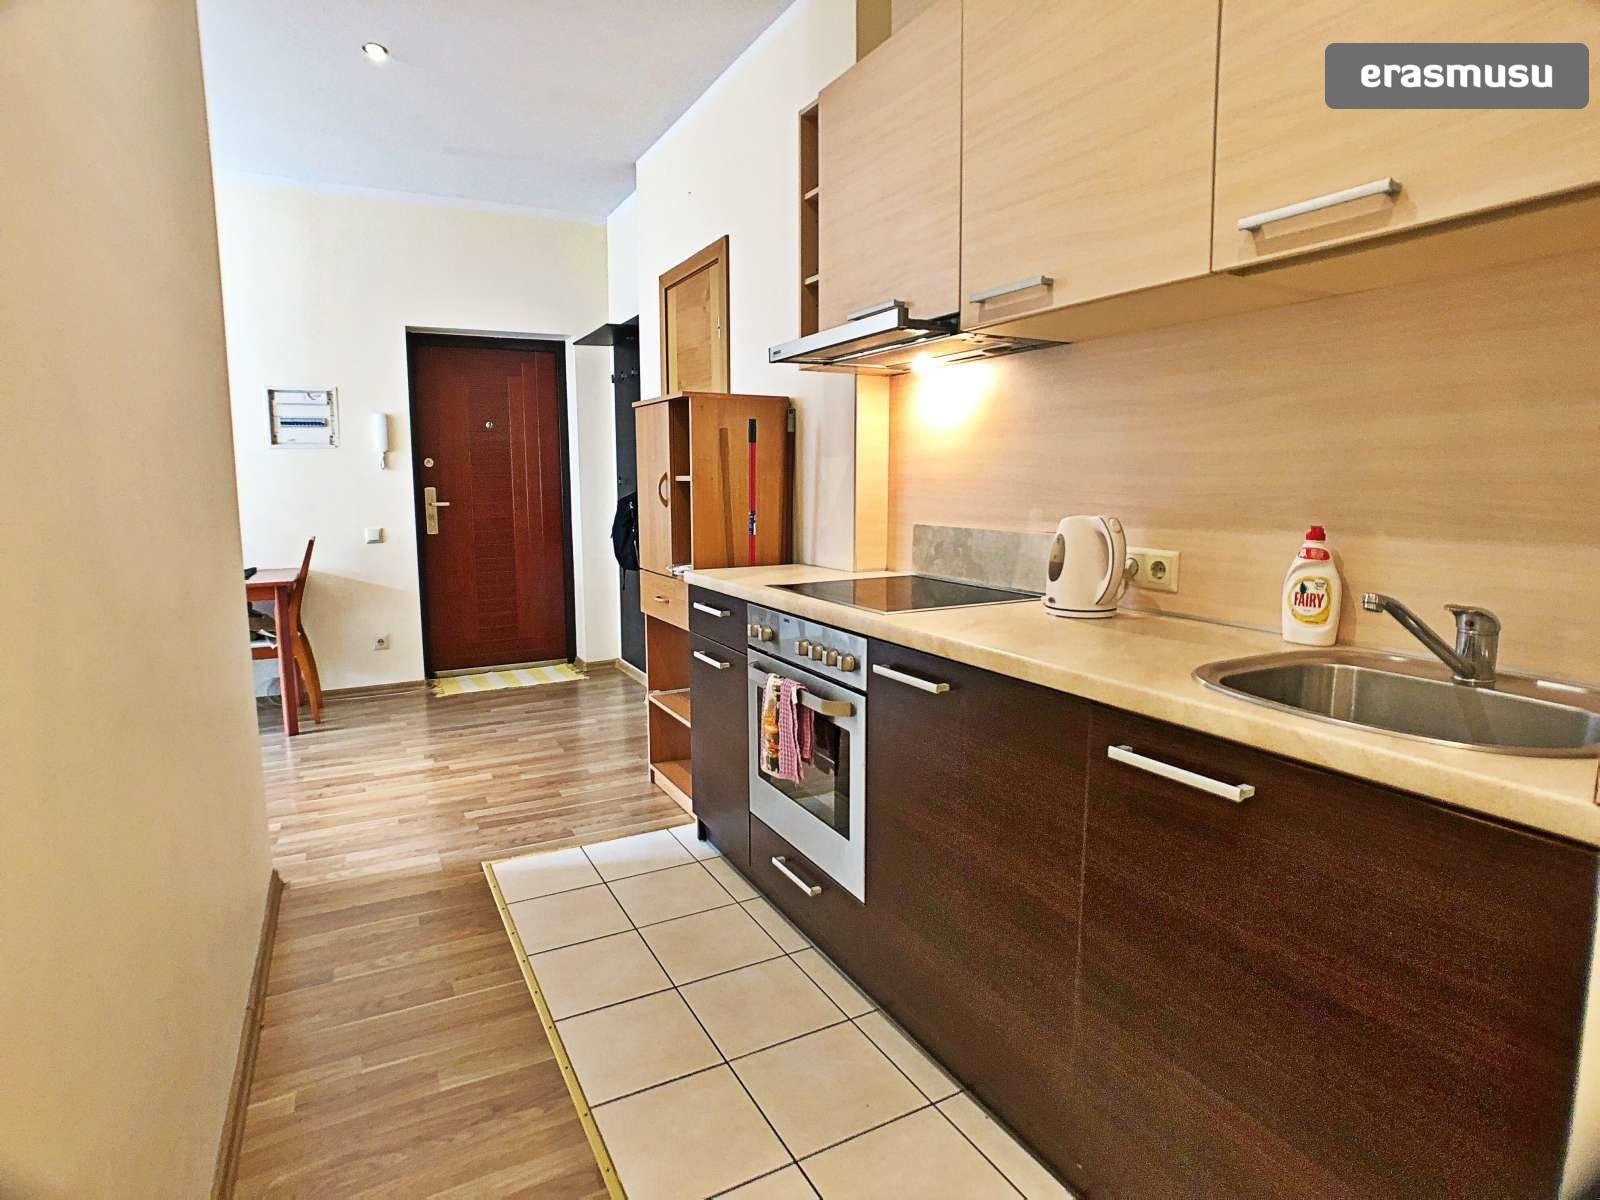 modern-1-bedroom-apartment-rent-maskavas-forstate-5b10ee870b7d4b